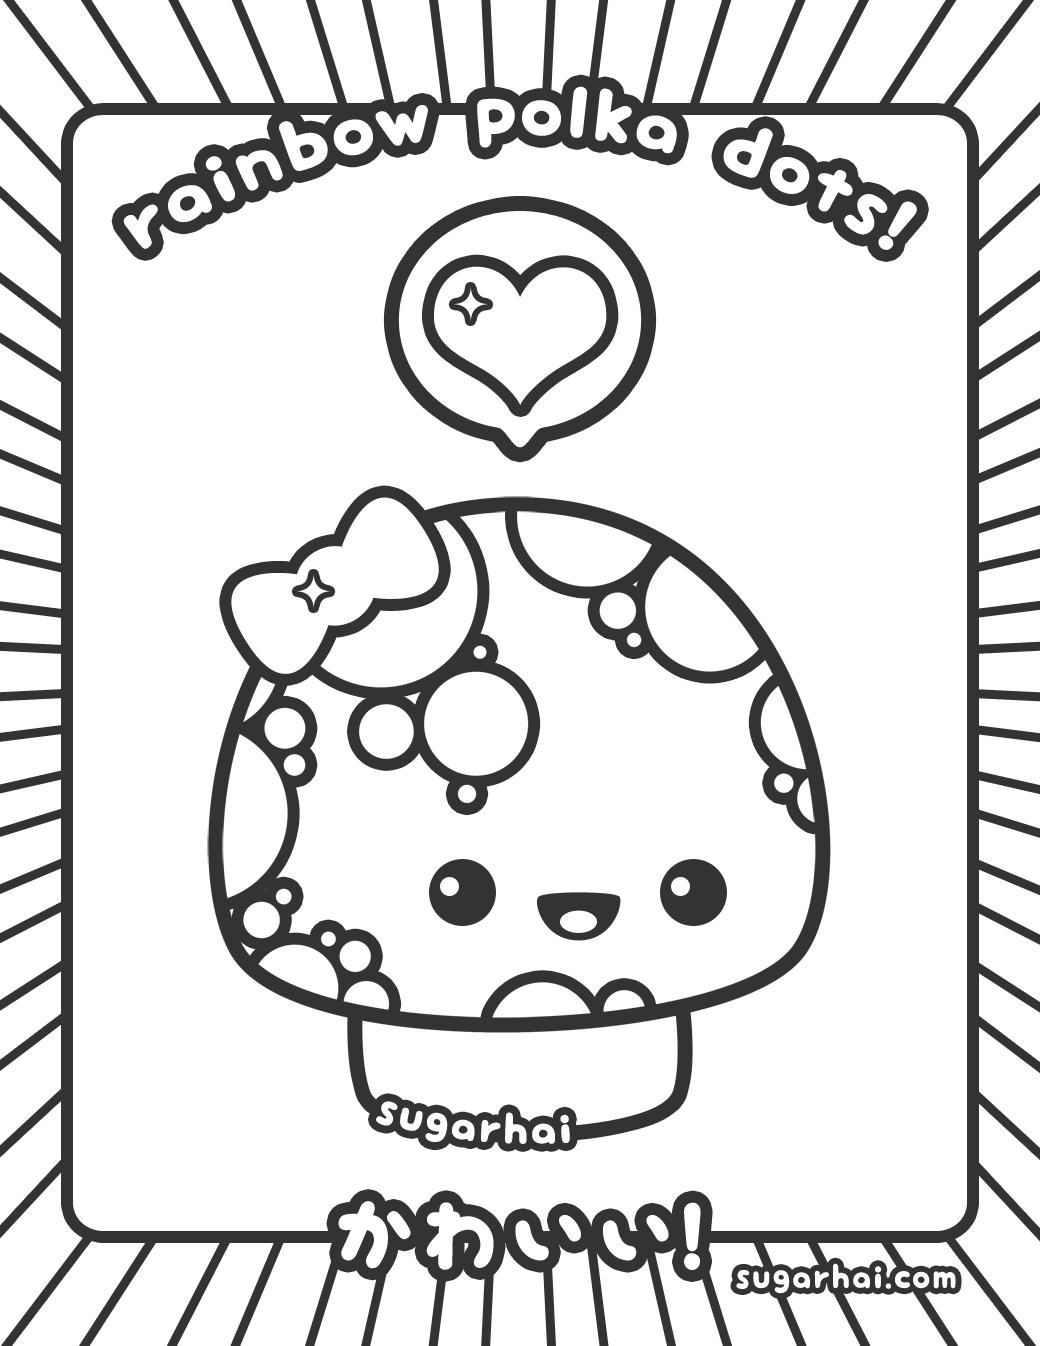 Free Mushroom Coloring Page Cute Coloring Pages Coloring Pages For Kids Fox Coloring Page